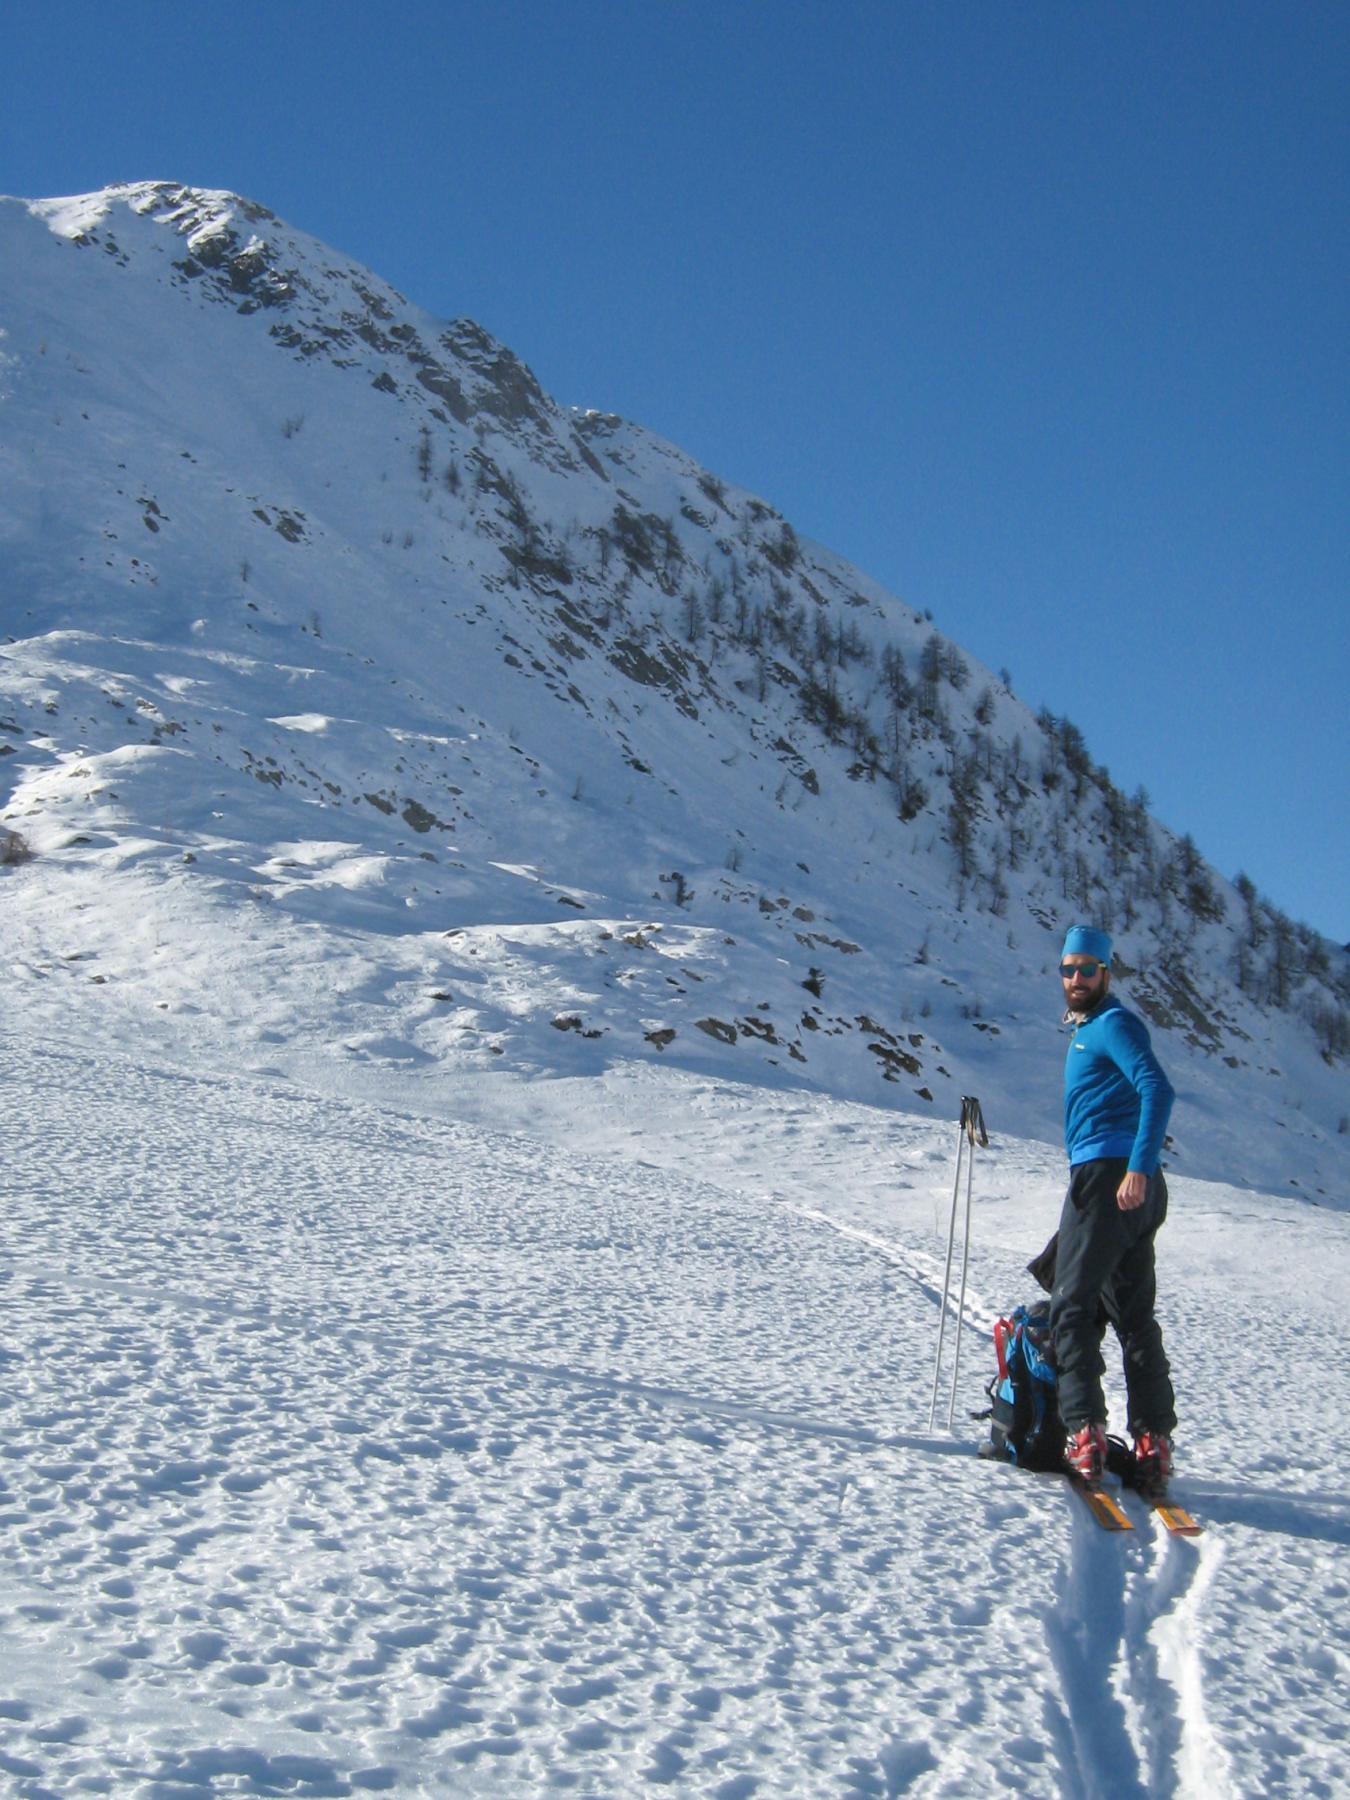 soddisfazione neve